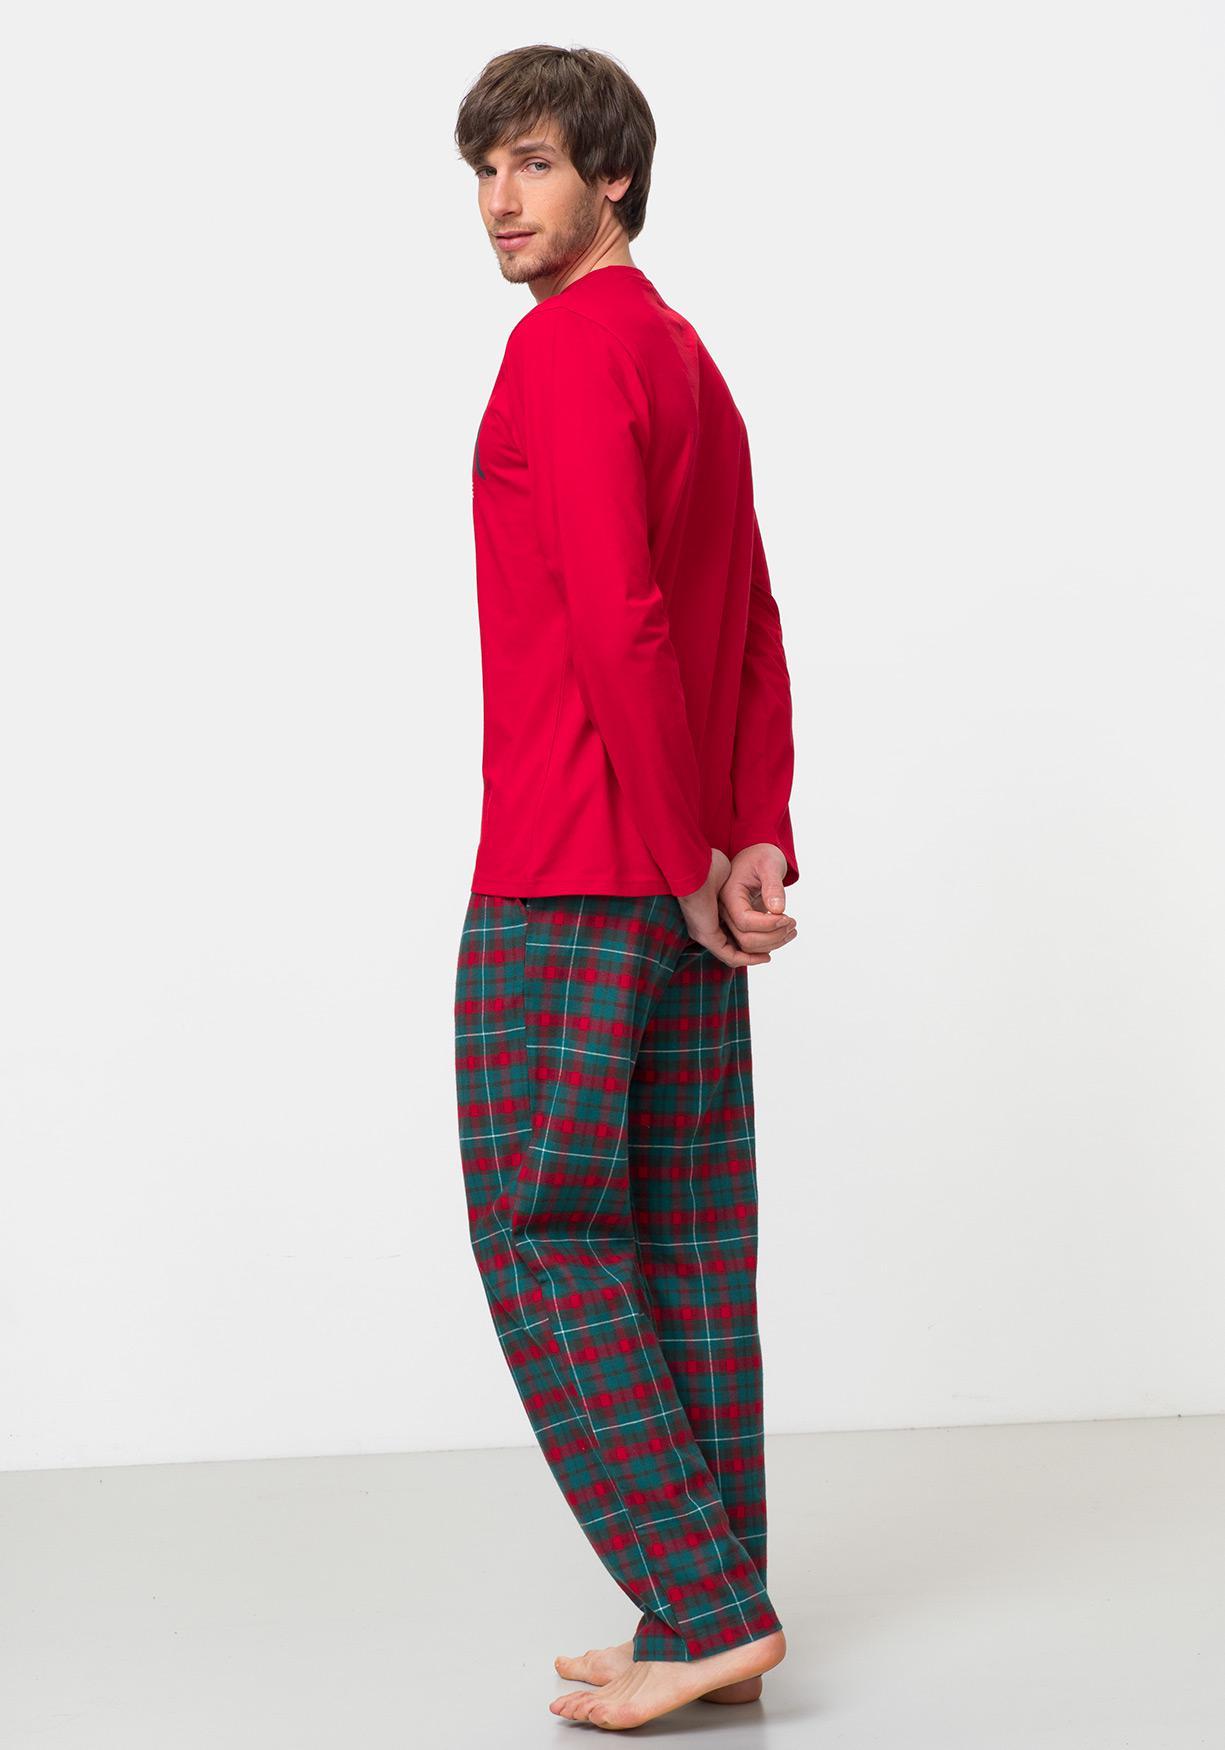 d5bfec8eb Comprar Pijama de manga larga punto TEX. ¡Aprovéchate de nuestros ...